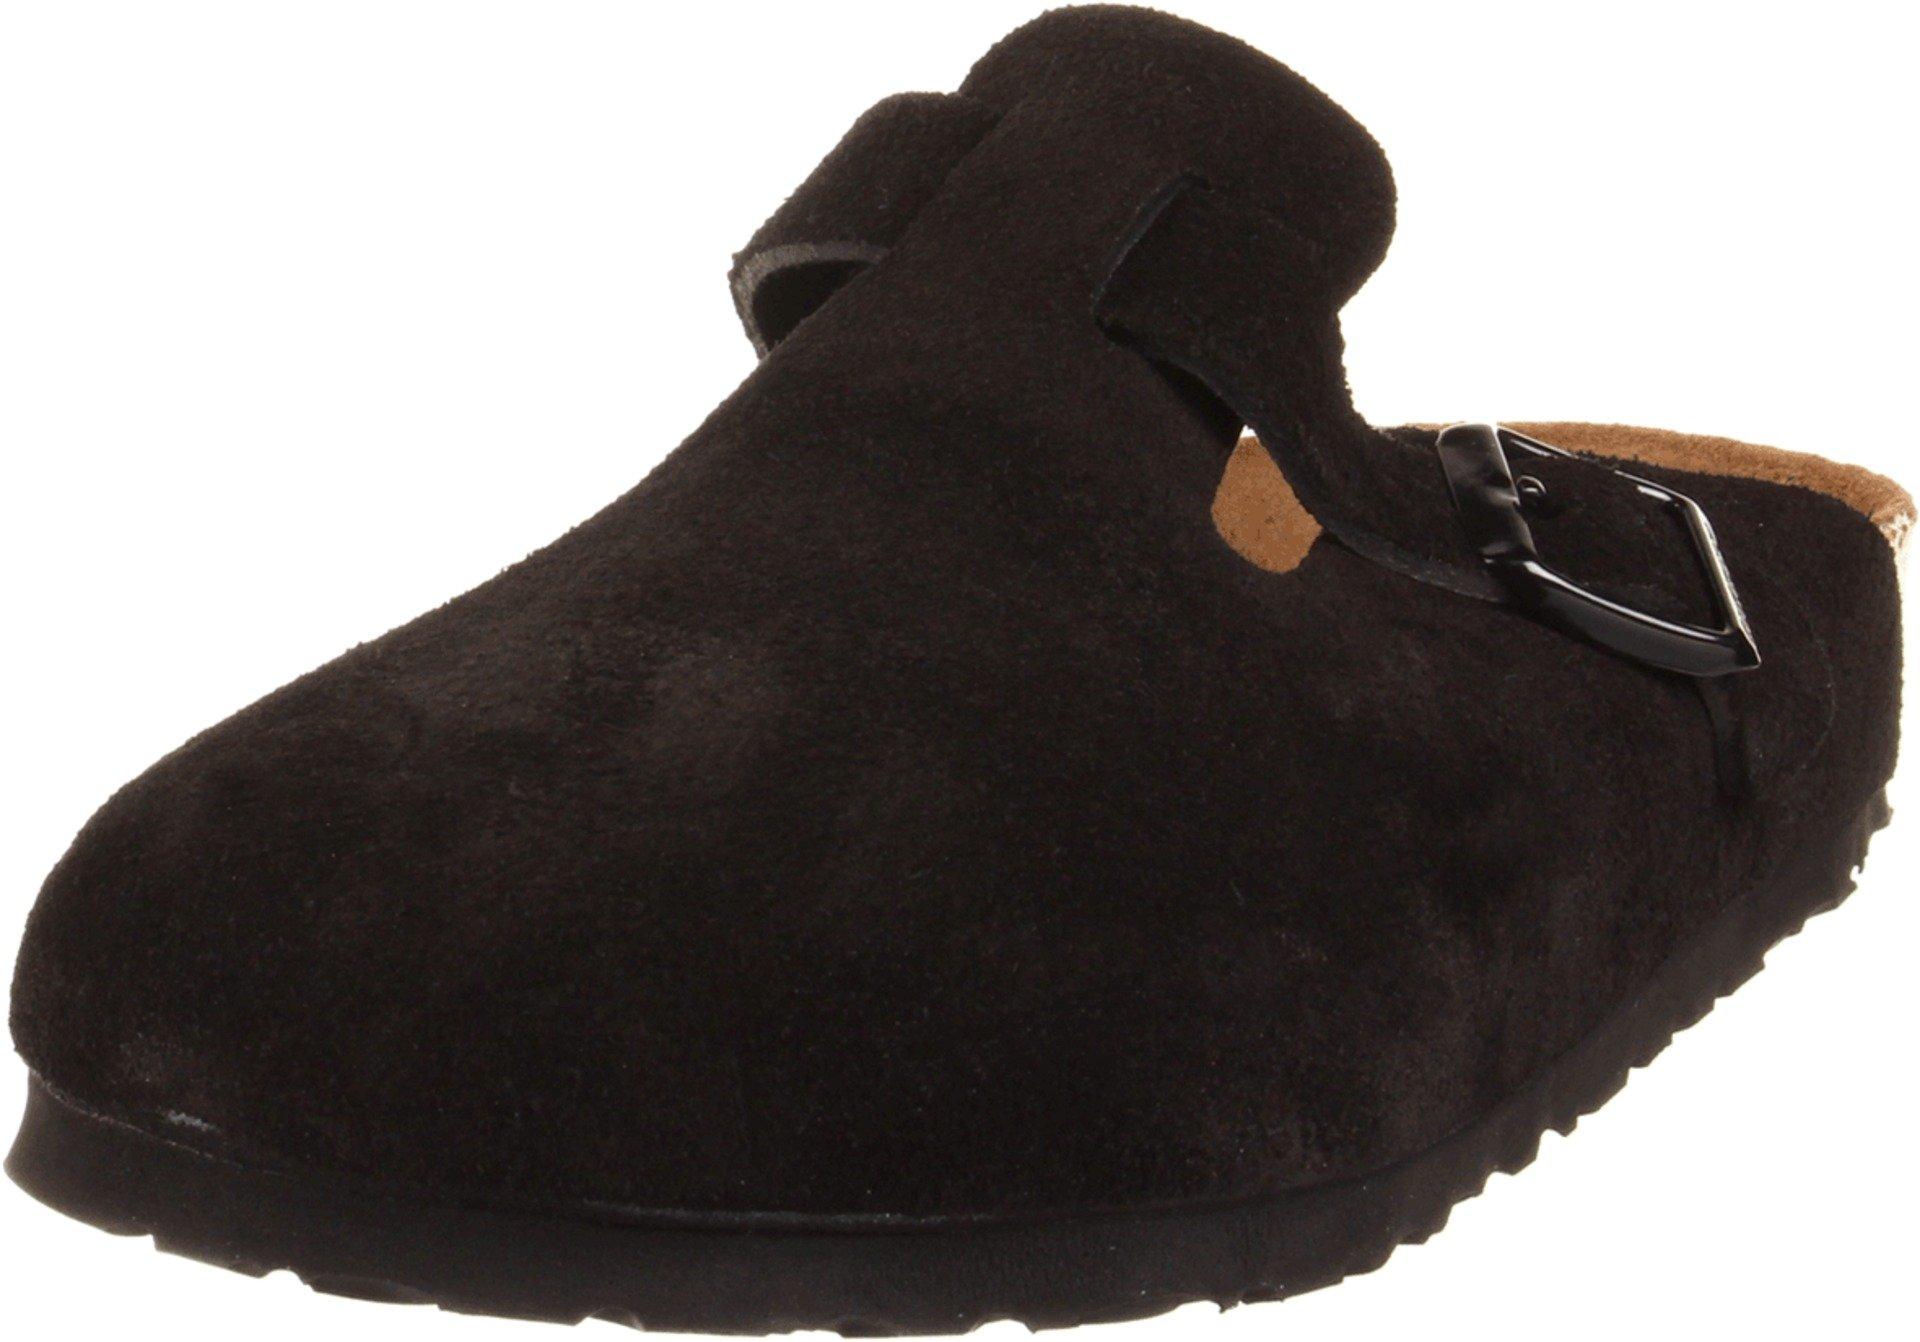 Birkenstock Unisex Boston Soft Footbed, Black Suede, 43 M EU